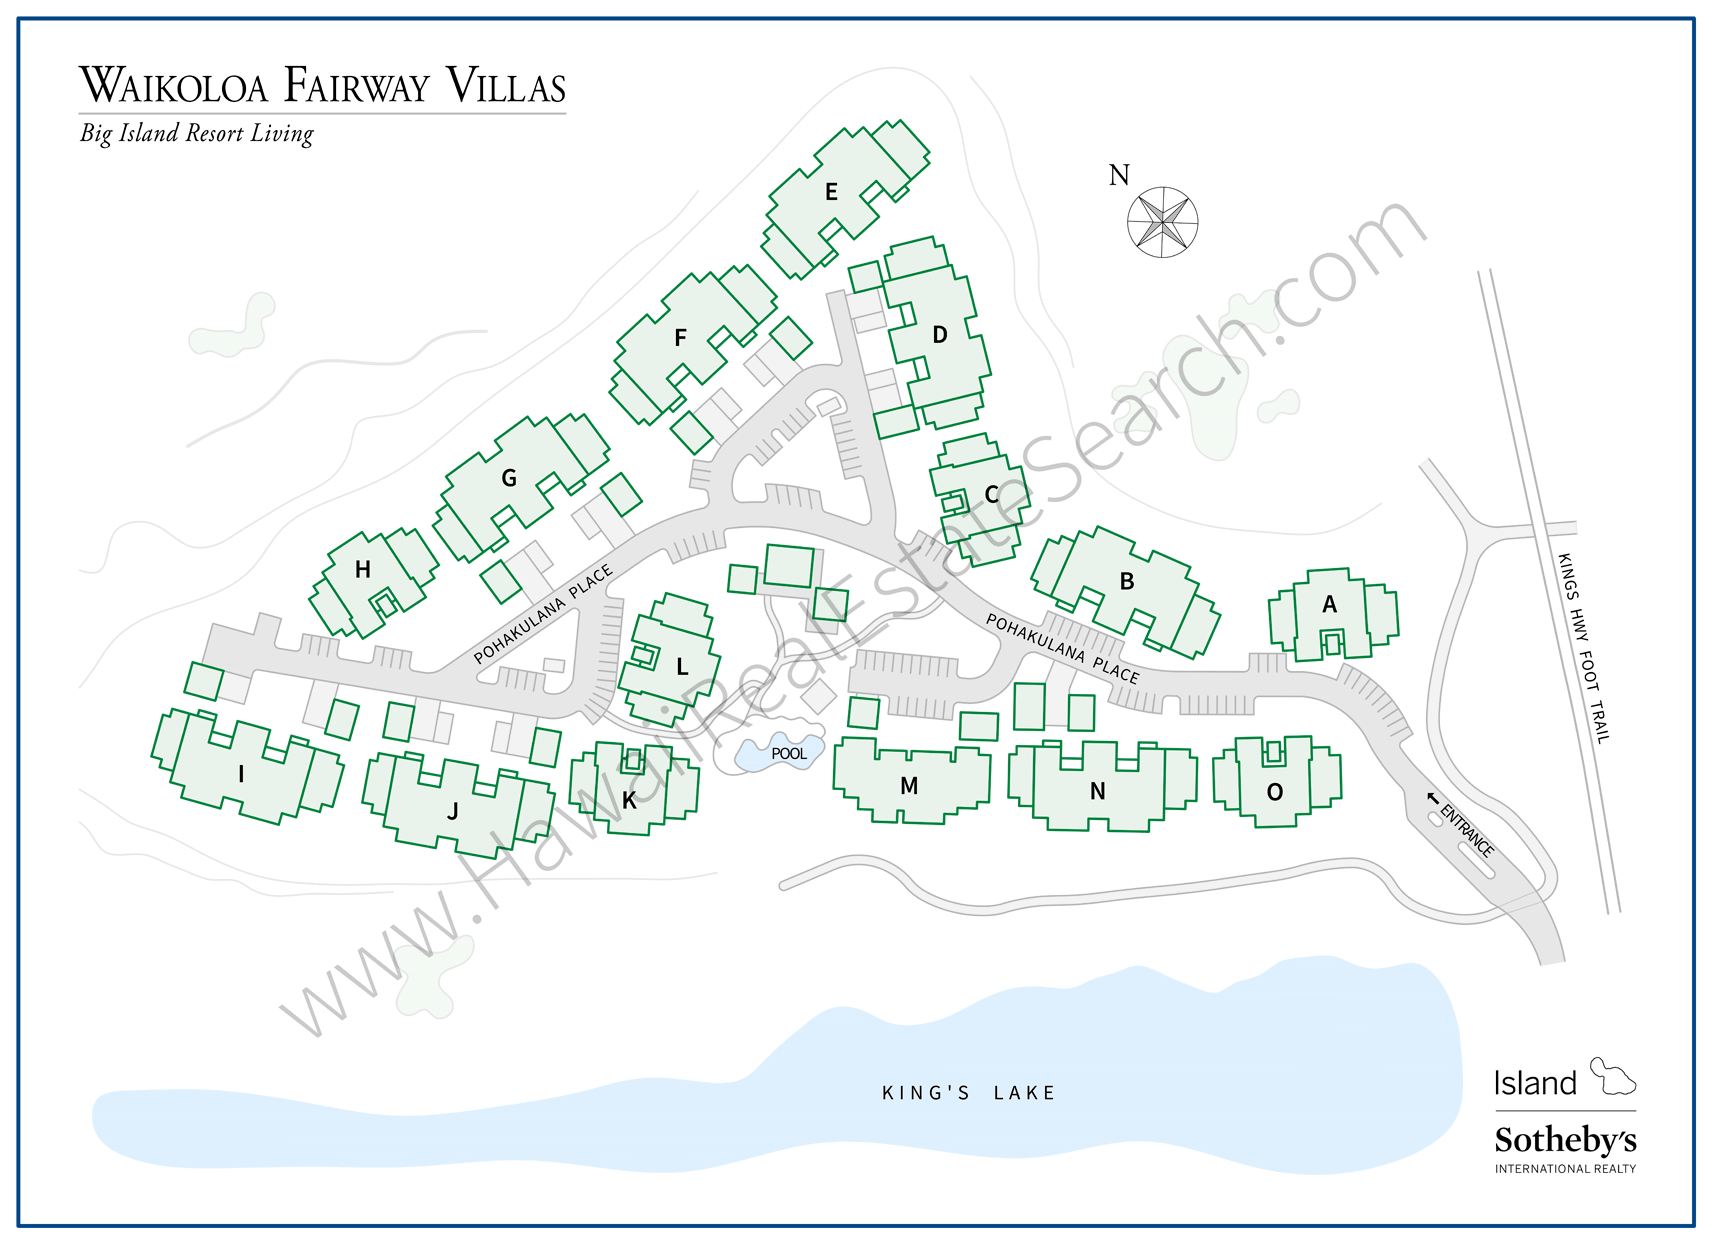 Fairway Villas at Waikoloa For Sale | Kohala Big Island